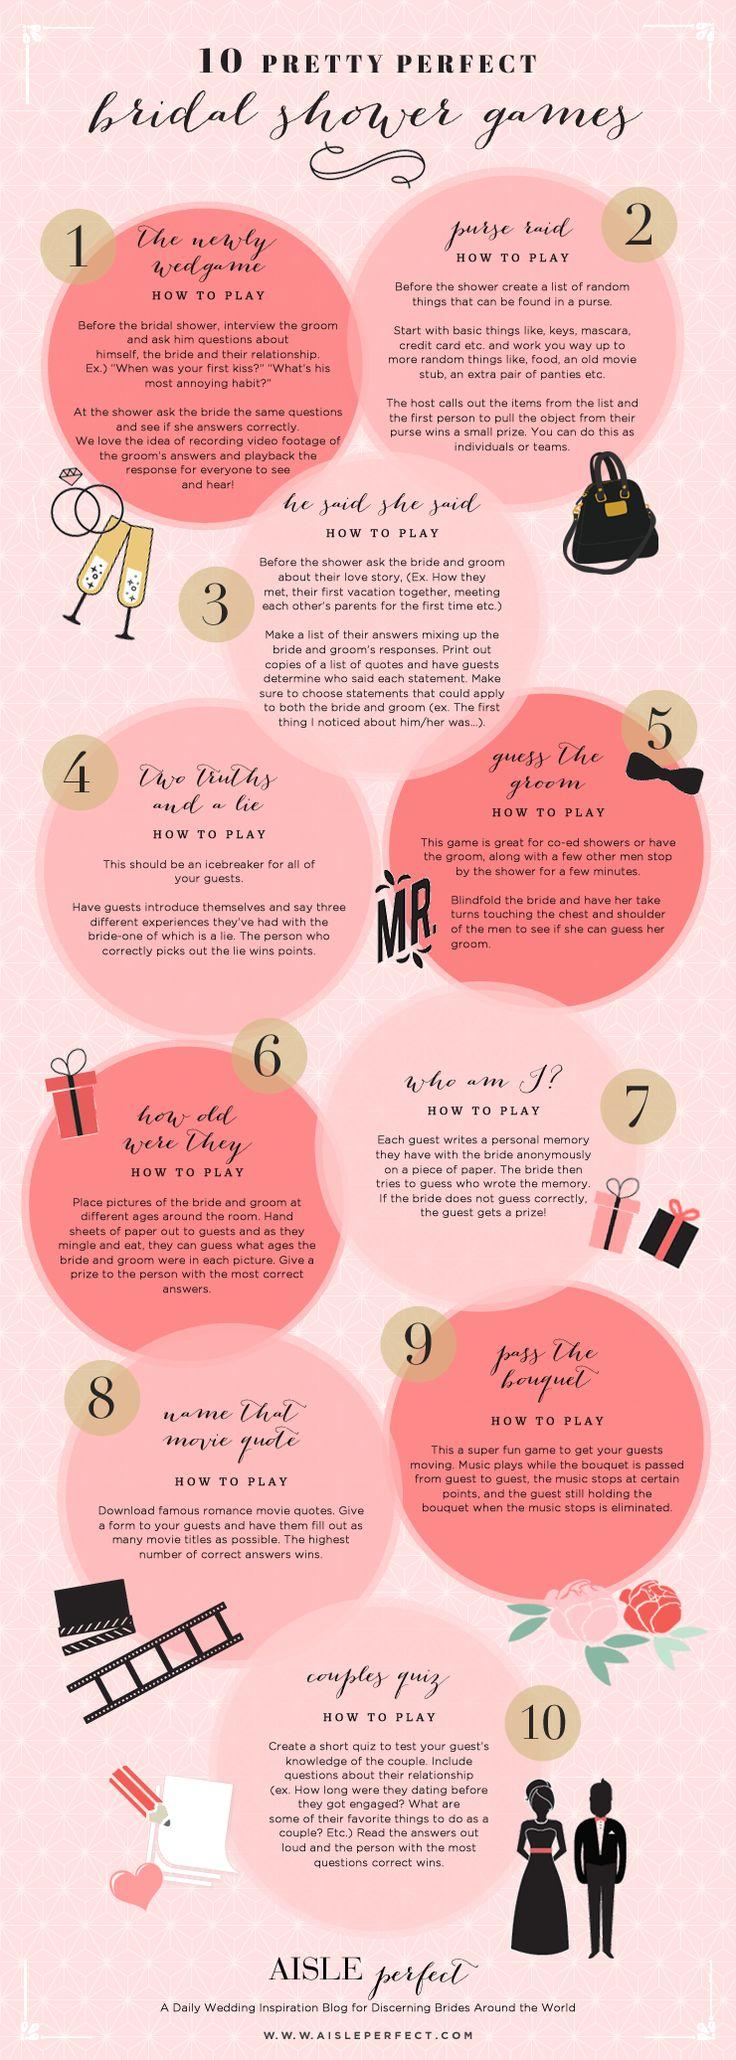 Aisle Perfect Infographic | Smitten Blog Designs